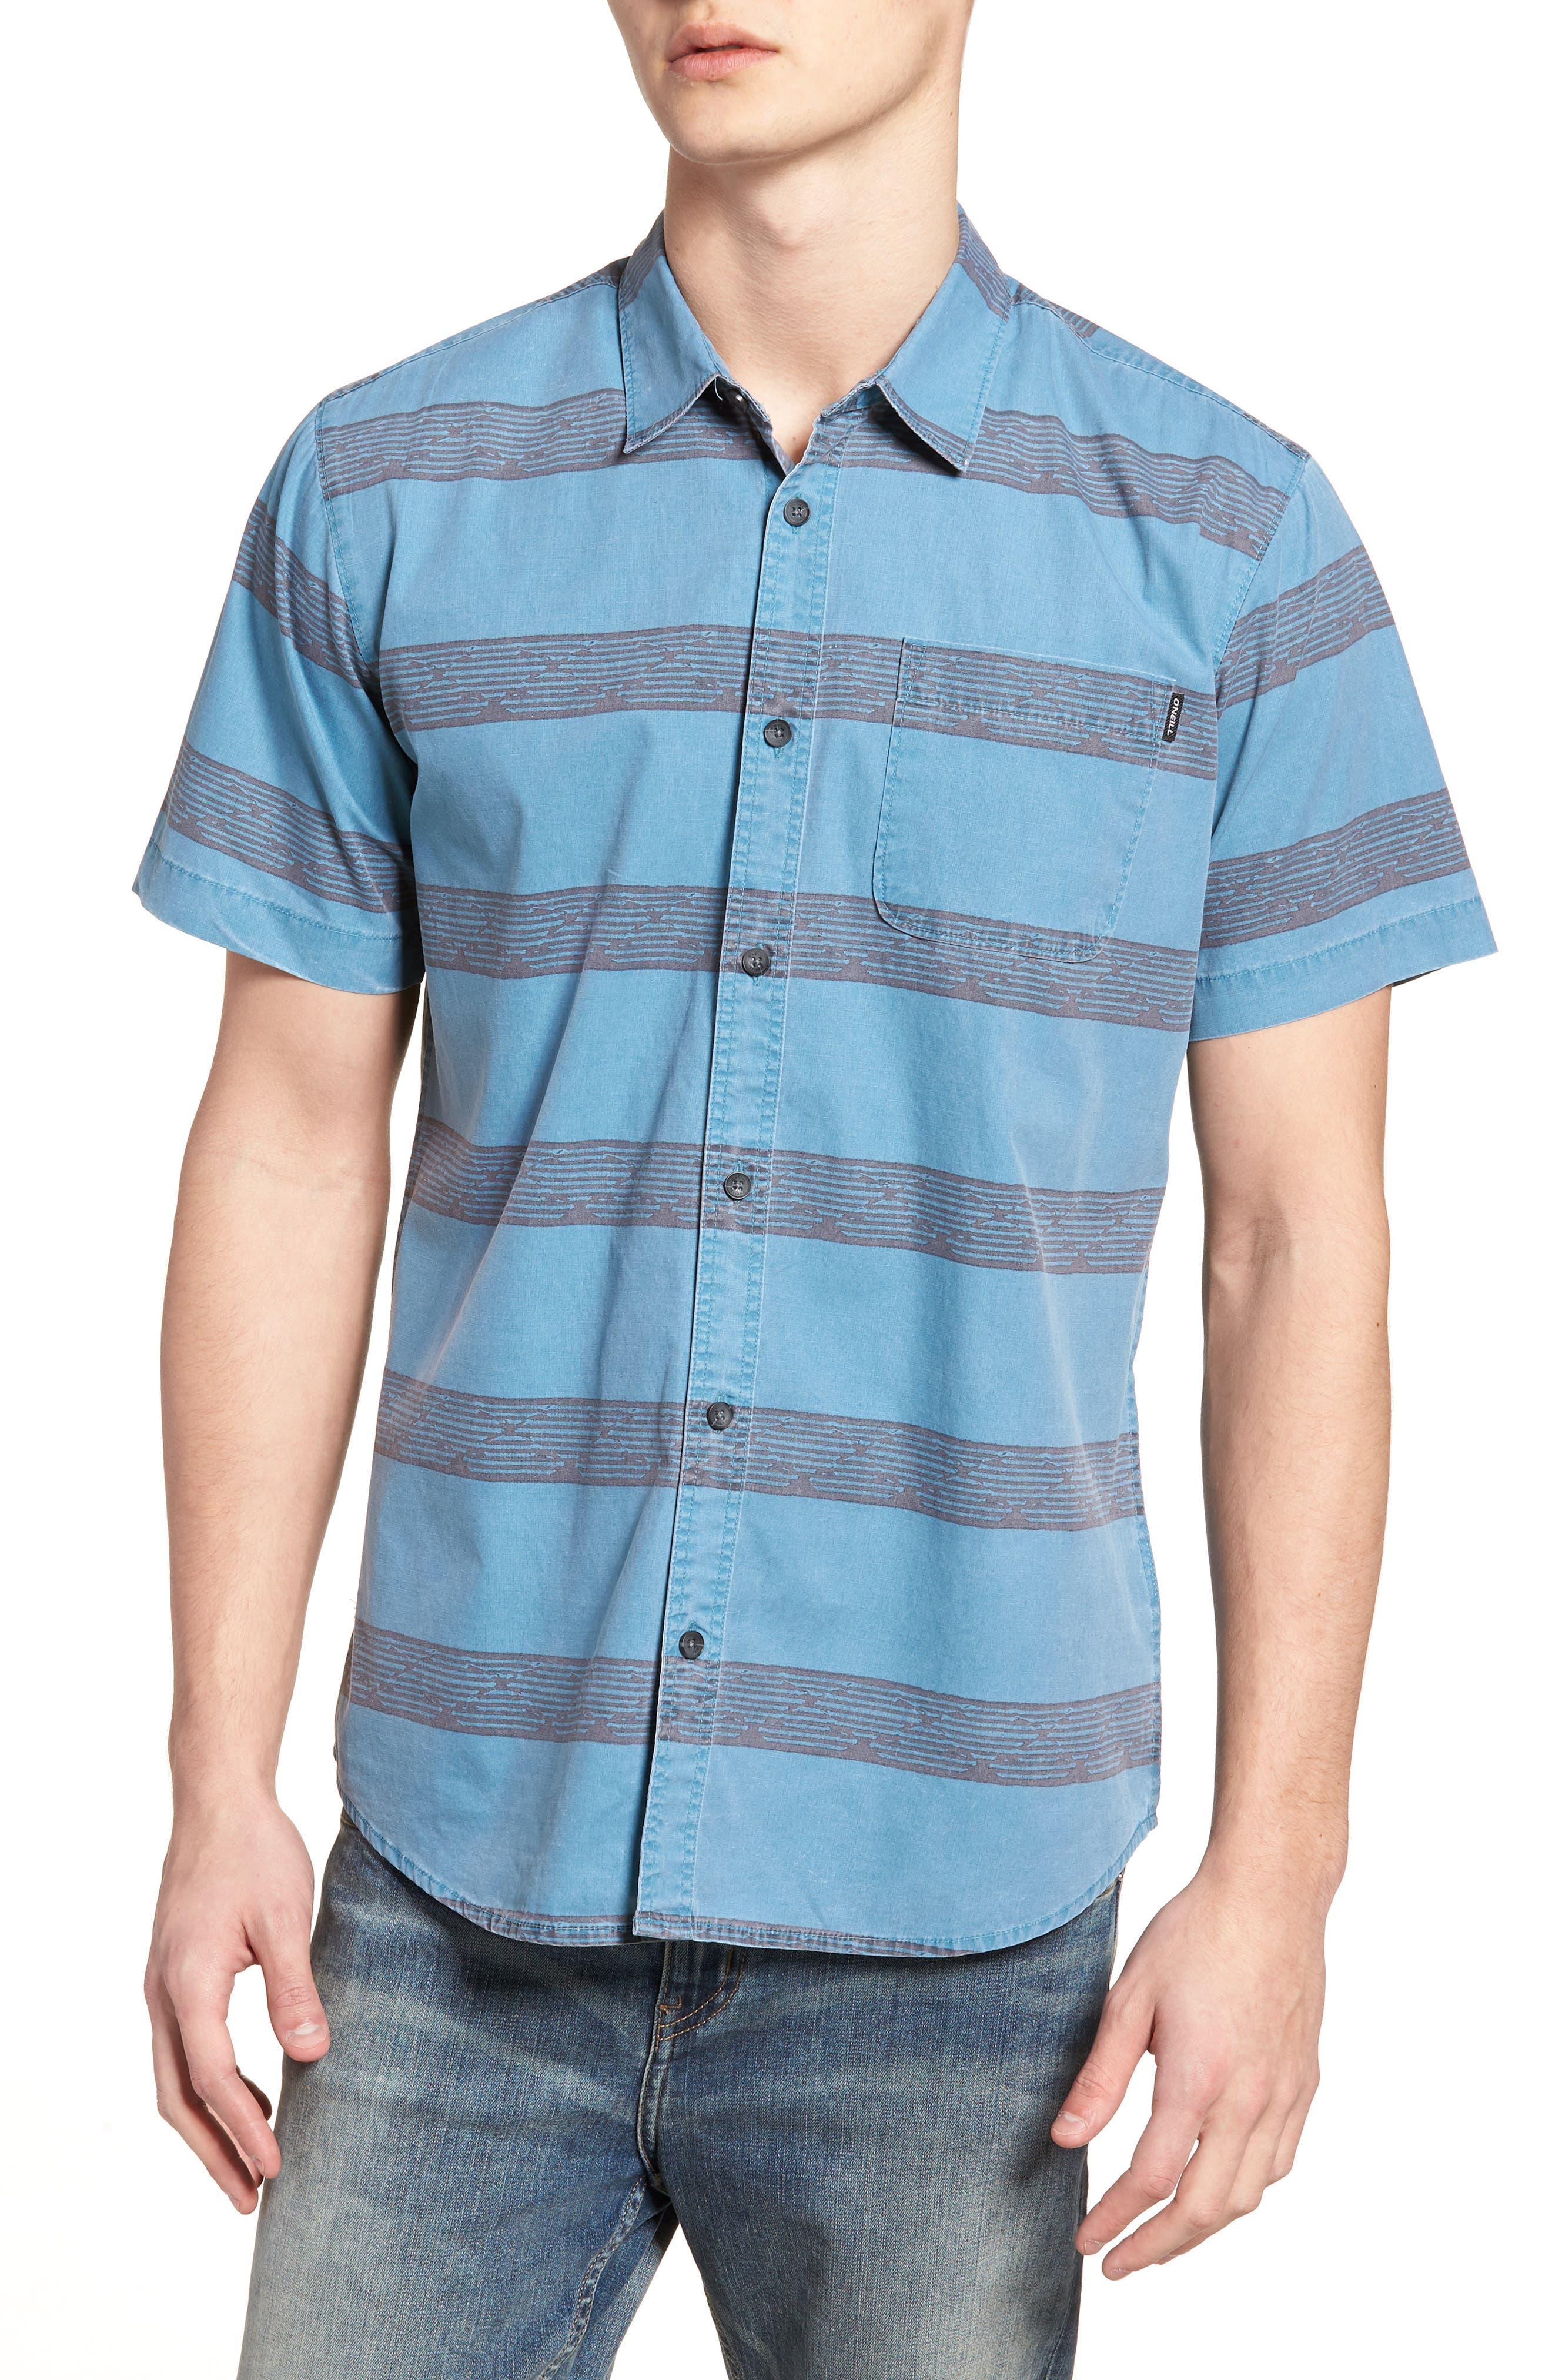 Wagner Woven Shirt,                         Main,                         color, DEEP TEAL